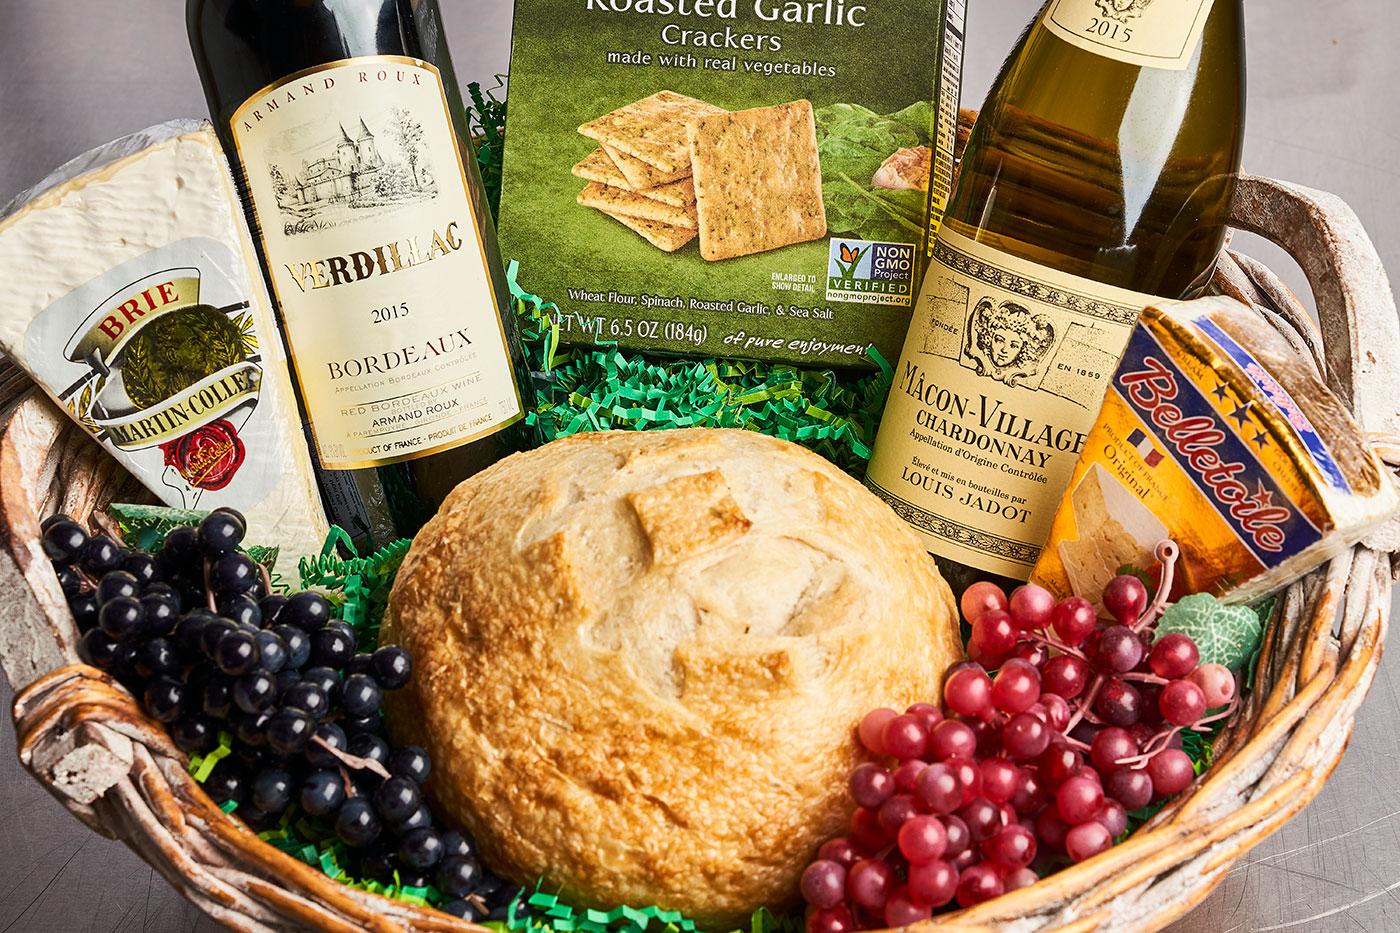 French Gift Basket design by Bayside Fresh Market.